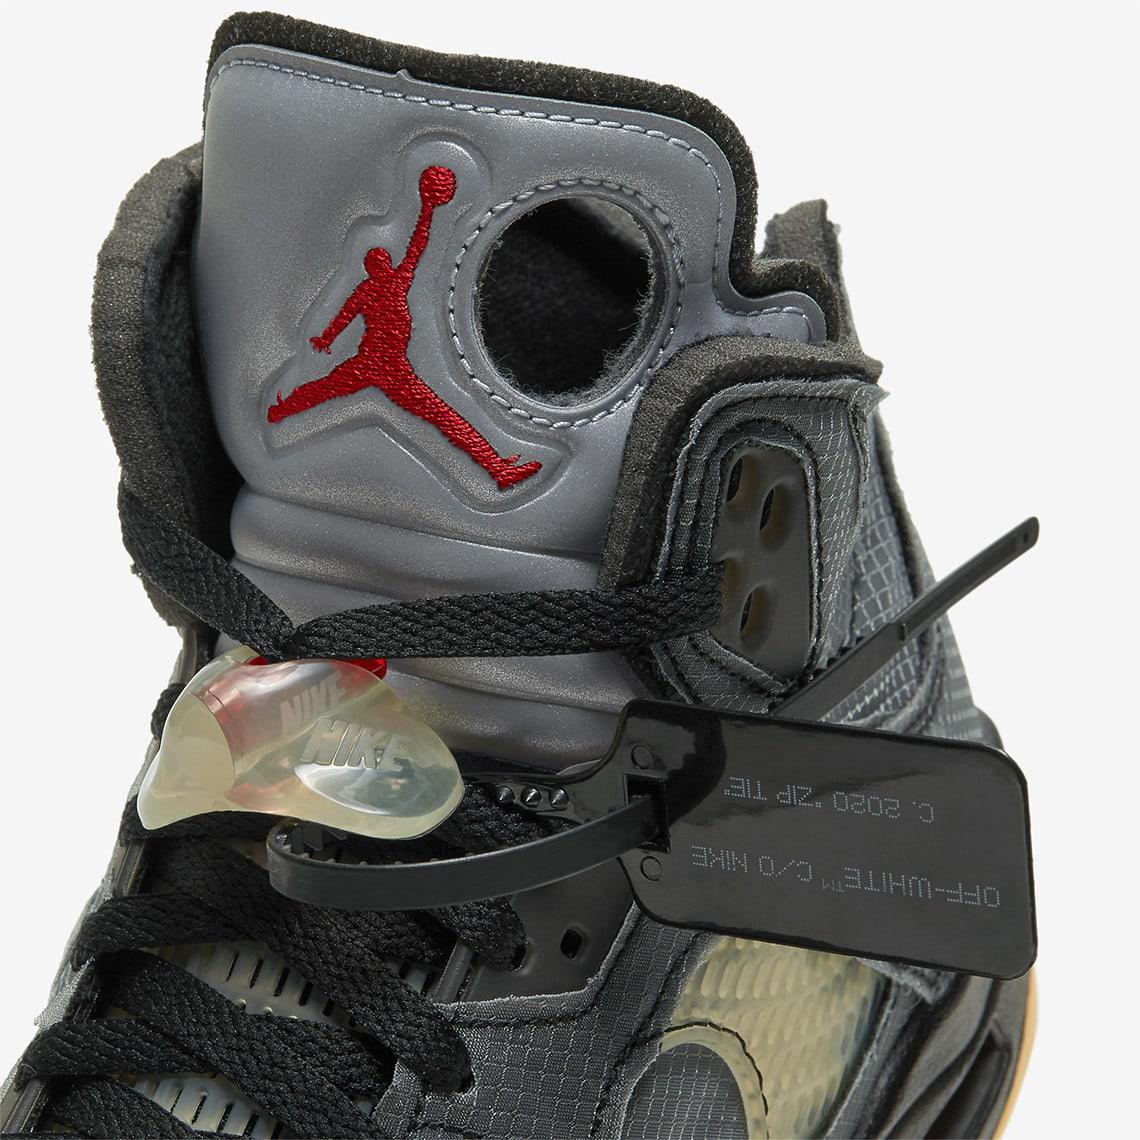 Off-White x Air Jordan 5 CT8480-001 (Tongue)